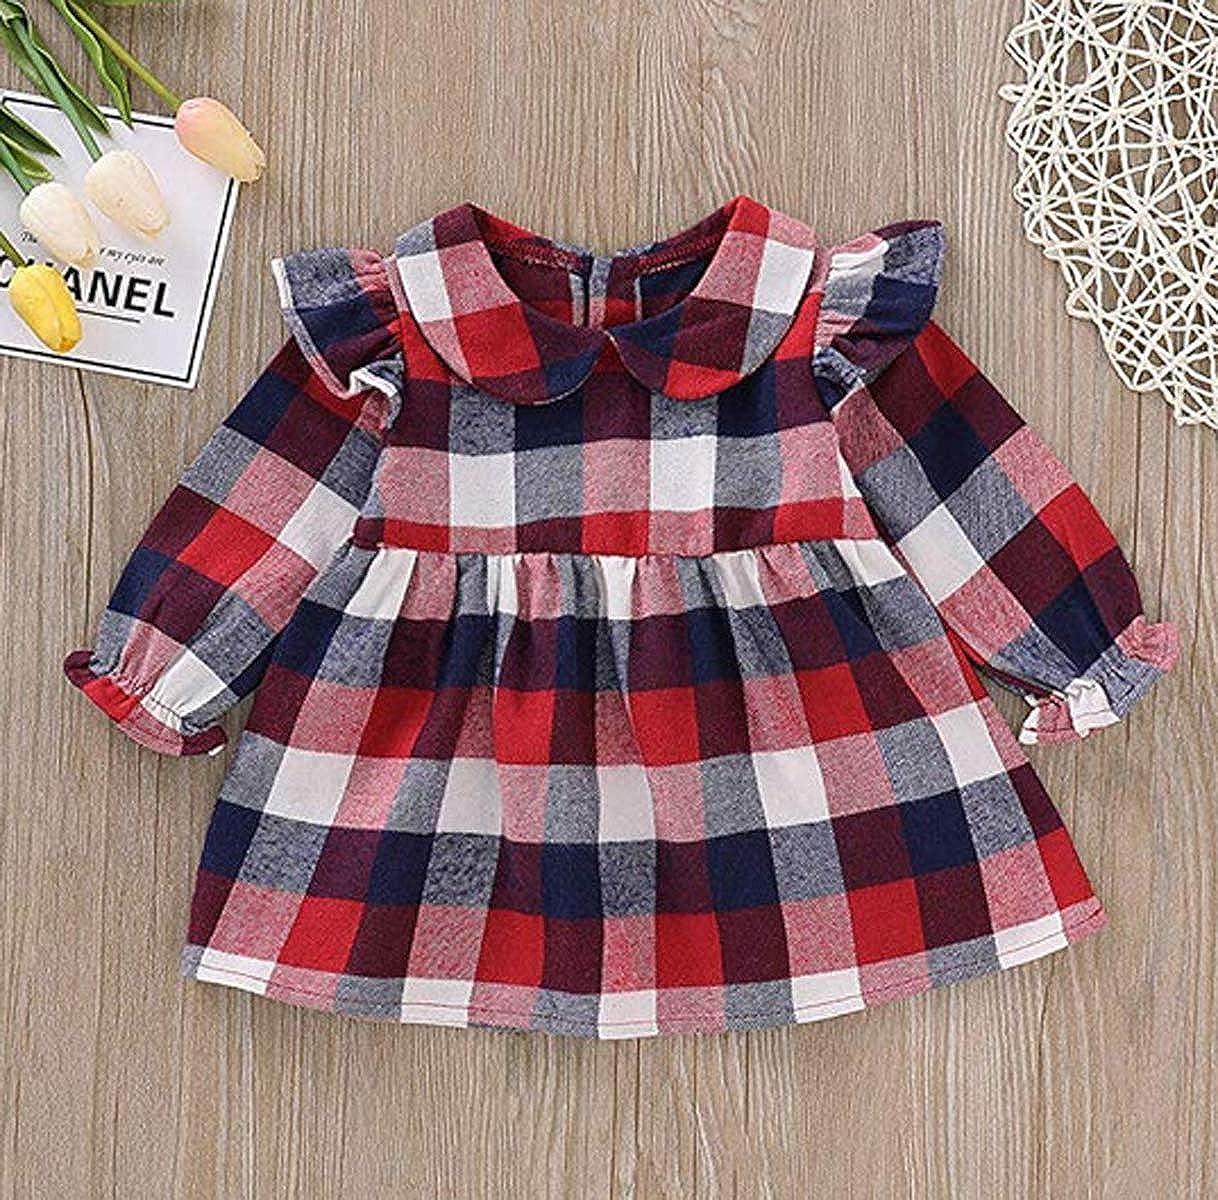 Newborn Infant Baby Girl Long Lantern Sleeve Ruffles Plaid Skirts Peter Pan Collar Party Princess Dress Outfits 0-24M